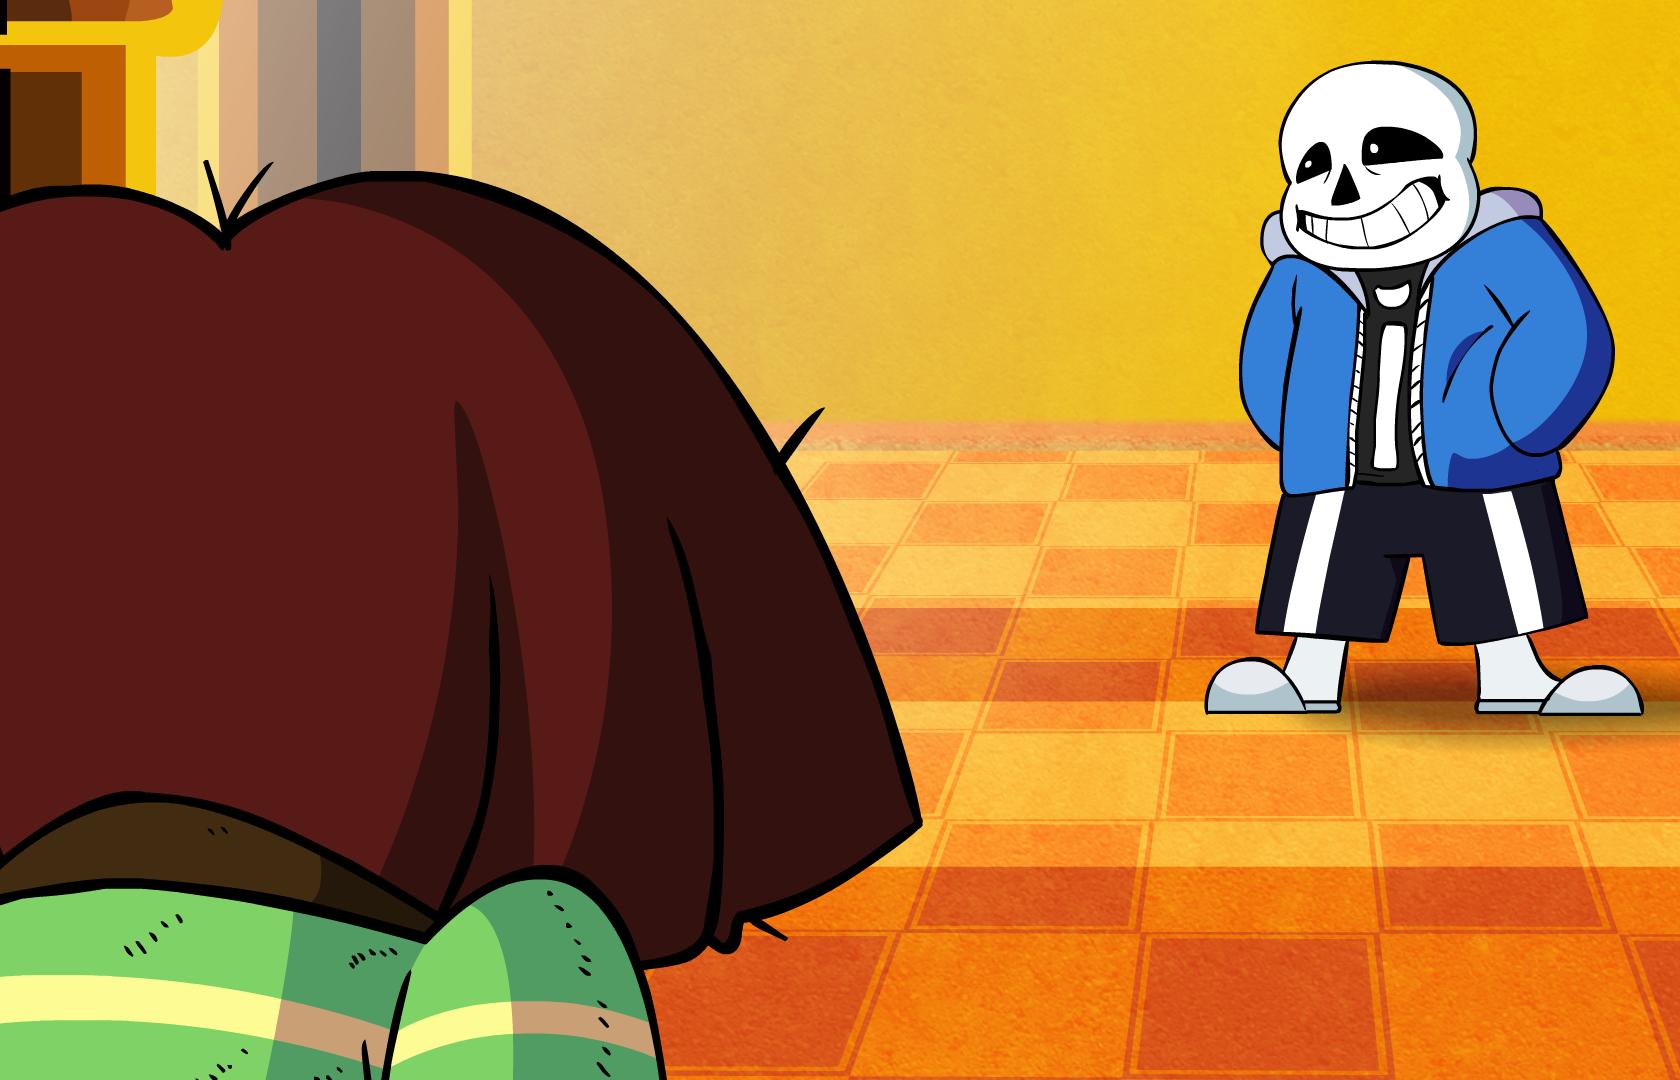 chara vs sans undertale animation